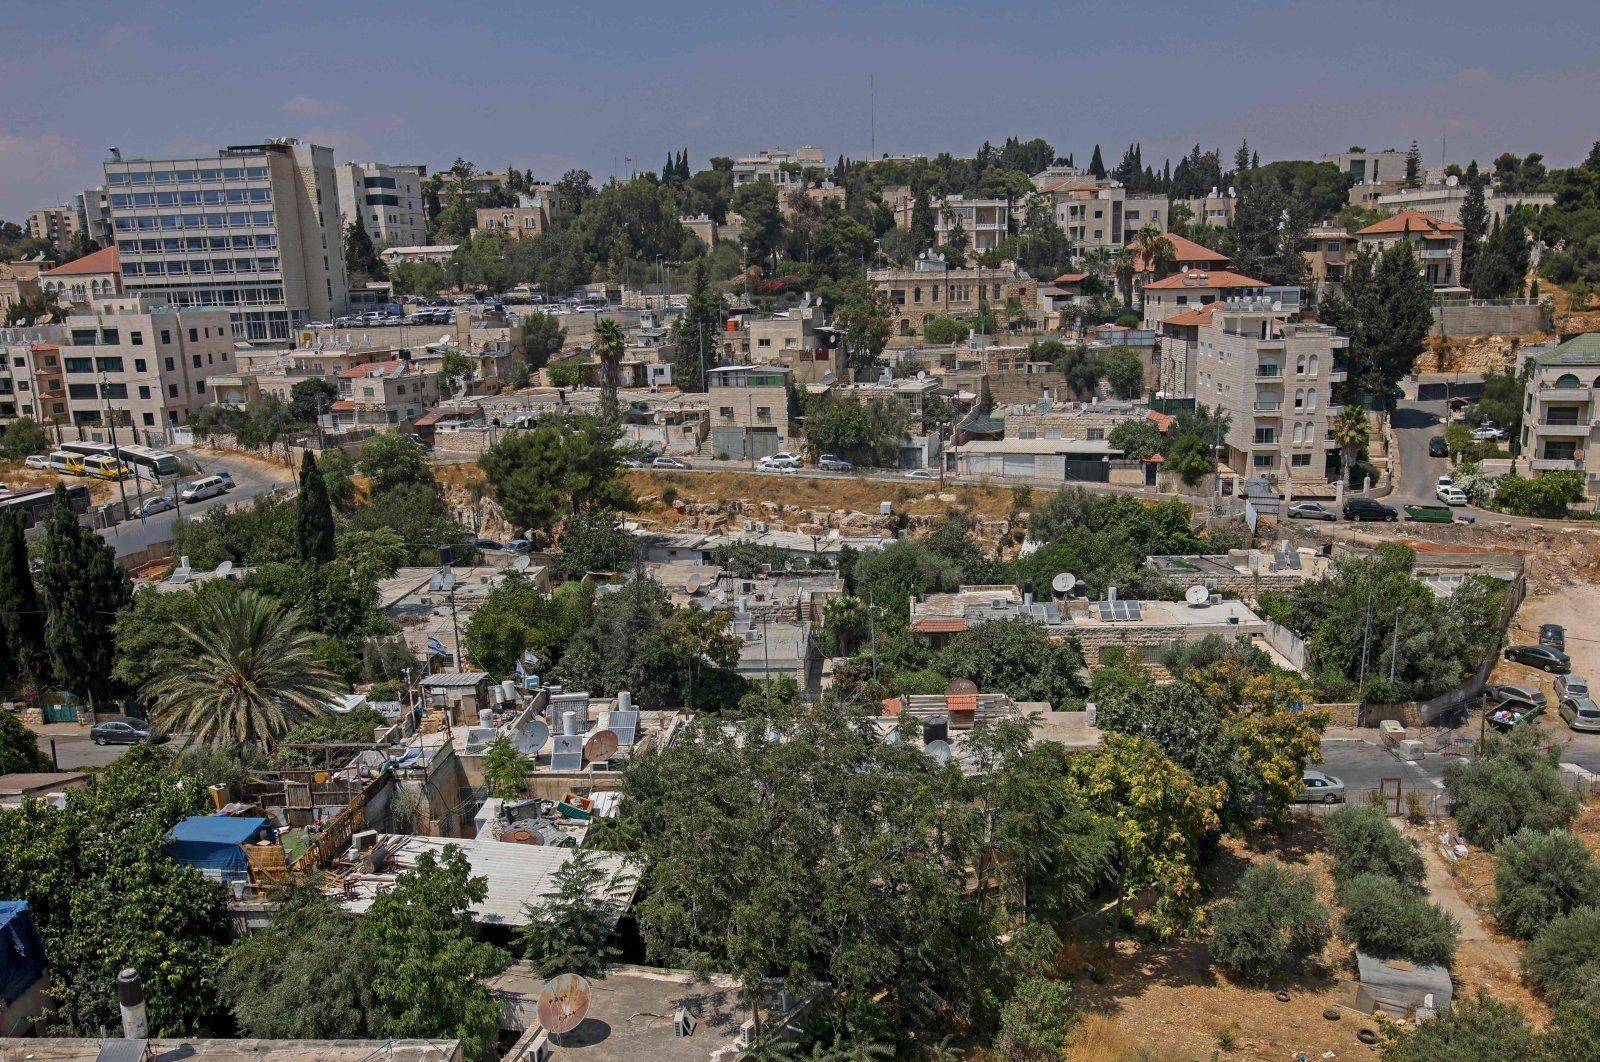 The Sheikh Jarrah neighborhood of East Jerusalem, occupied Palestine, July 26, 2021. (AFP Photo)